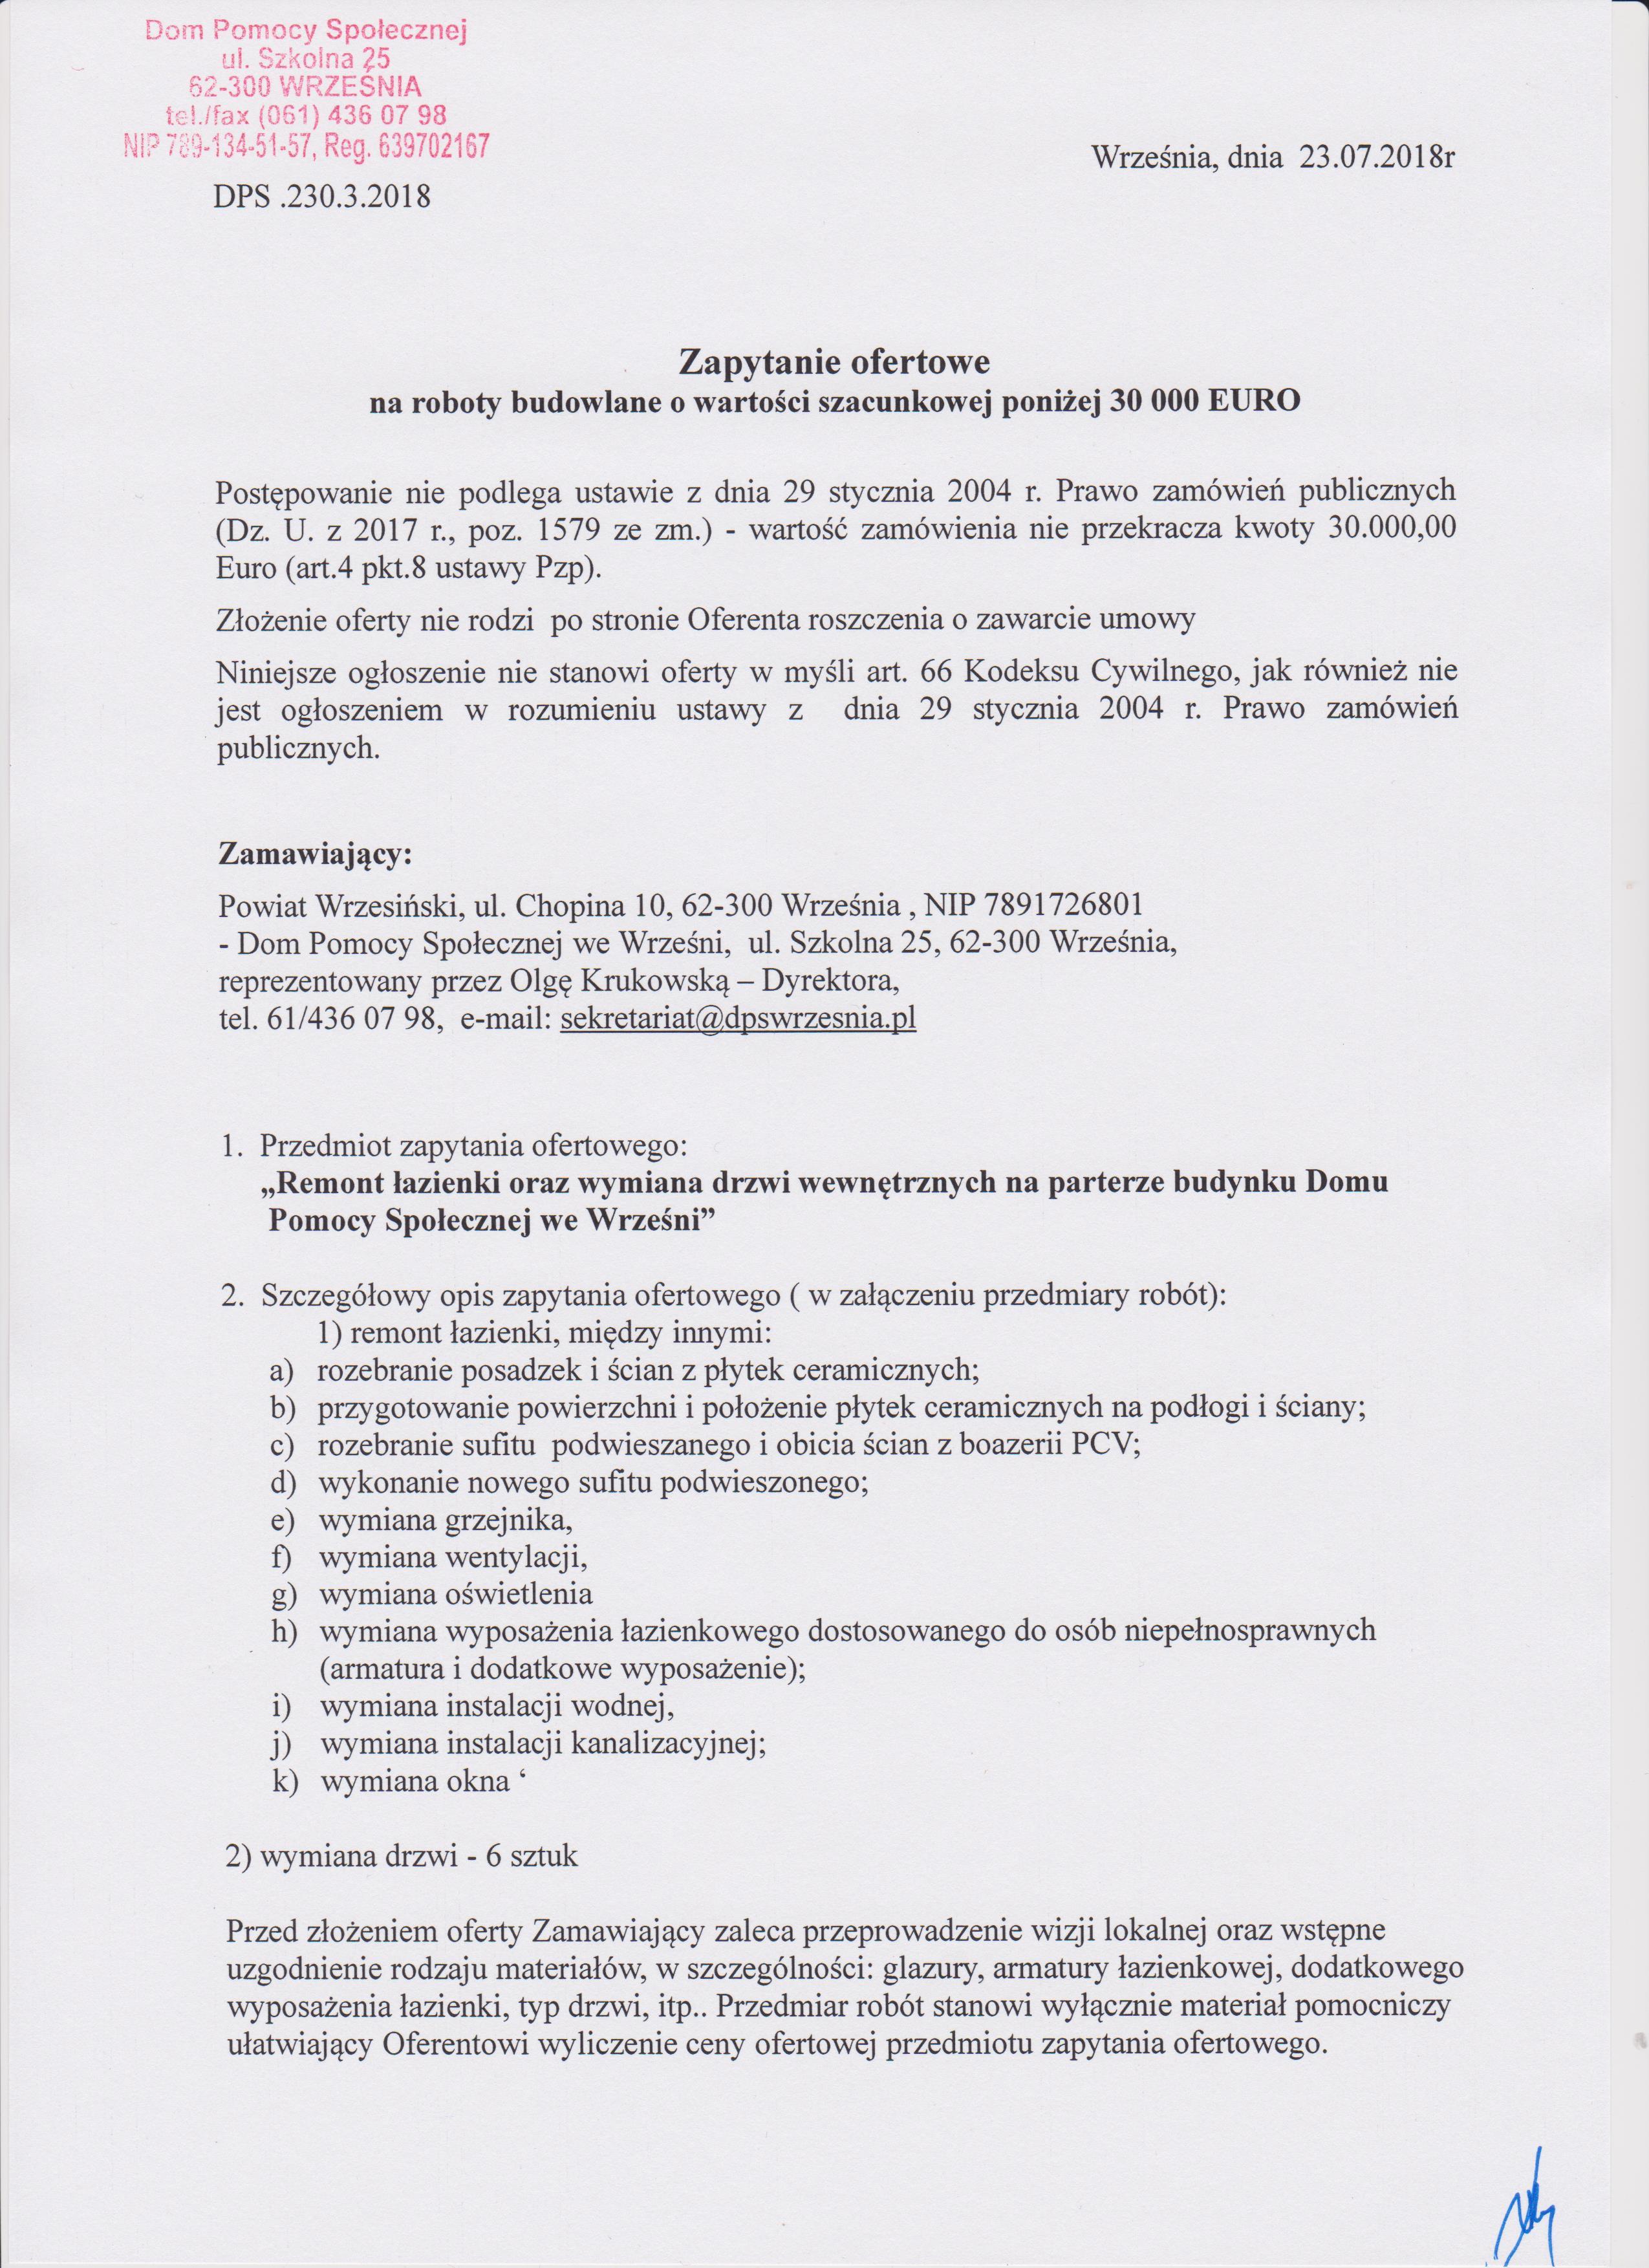 Umowa Na Remont Lazienki